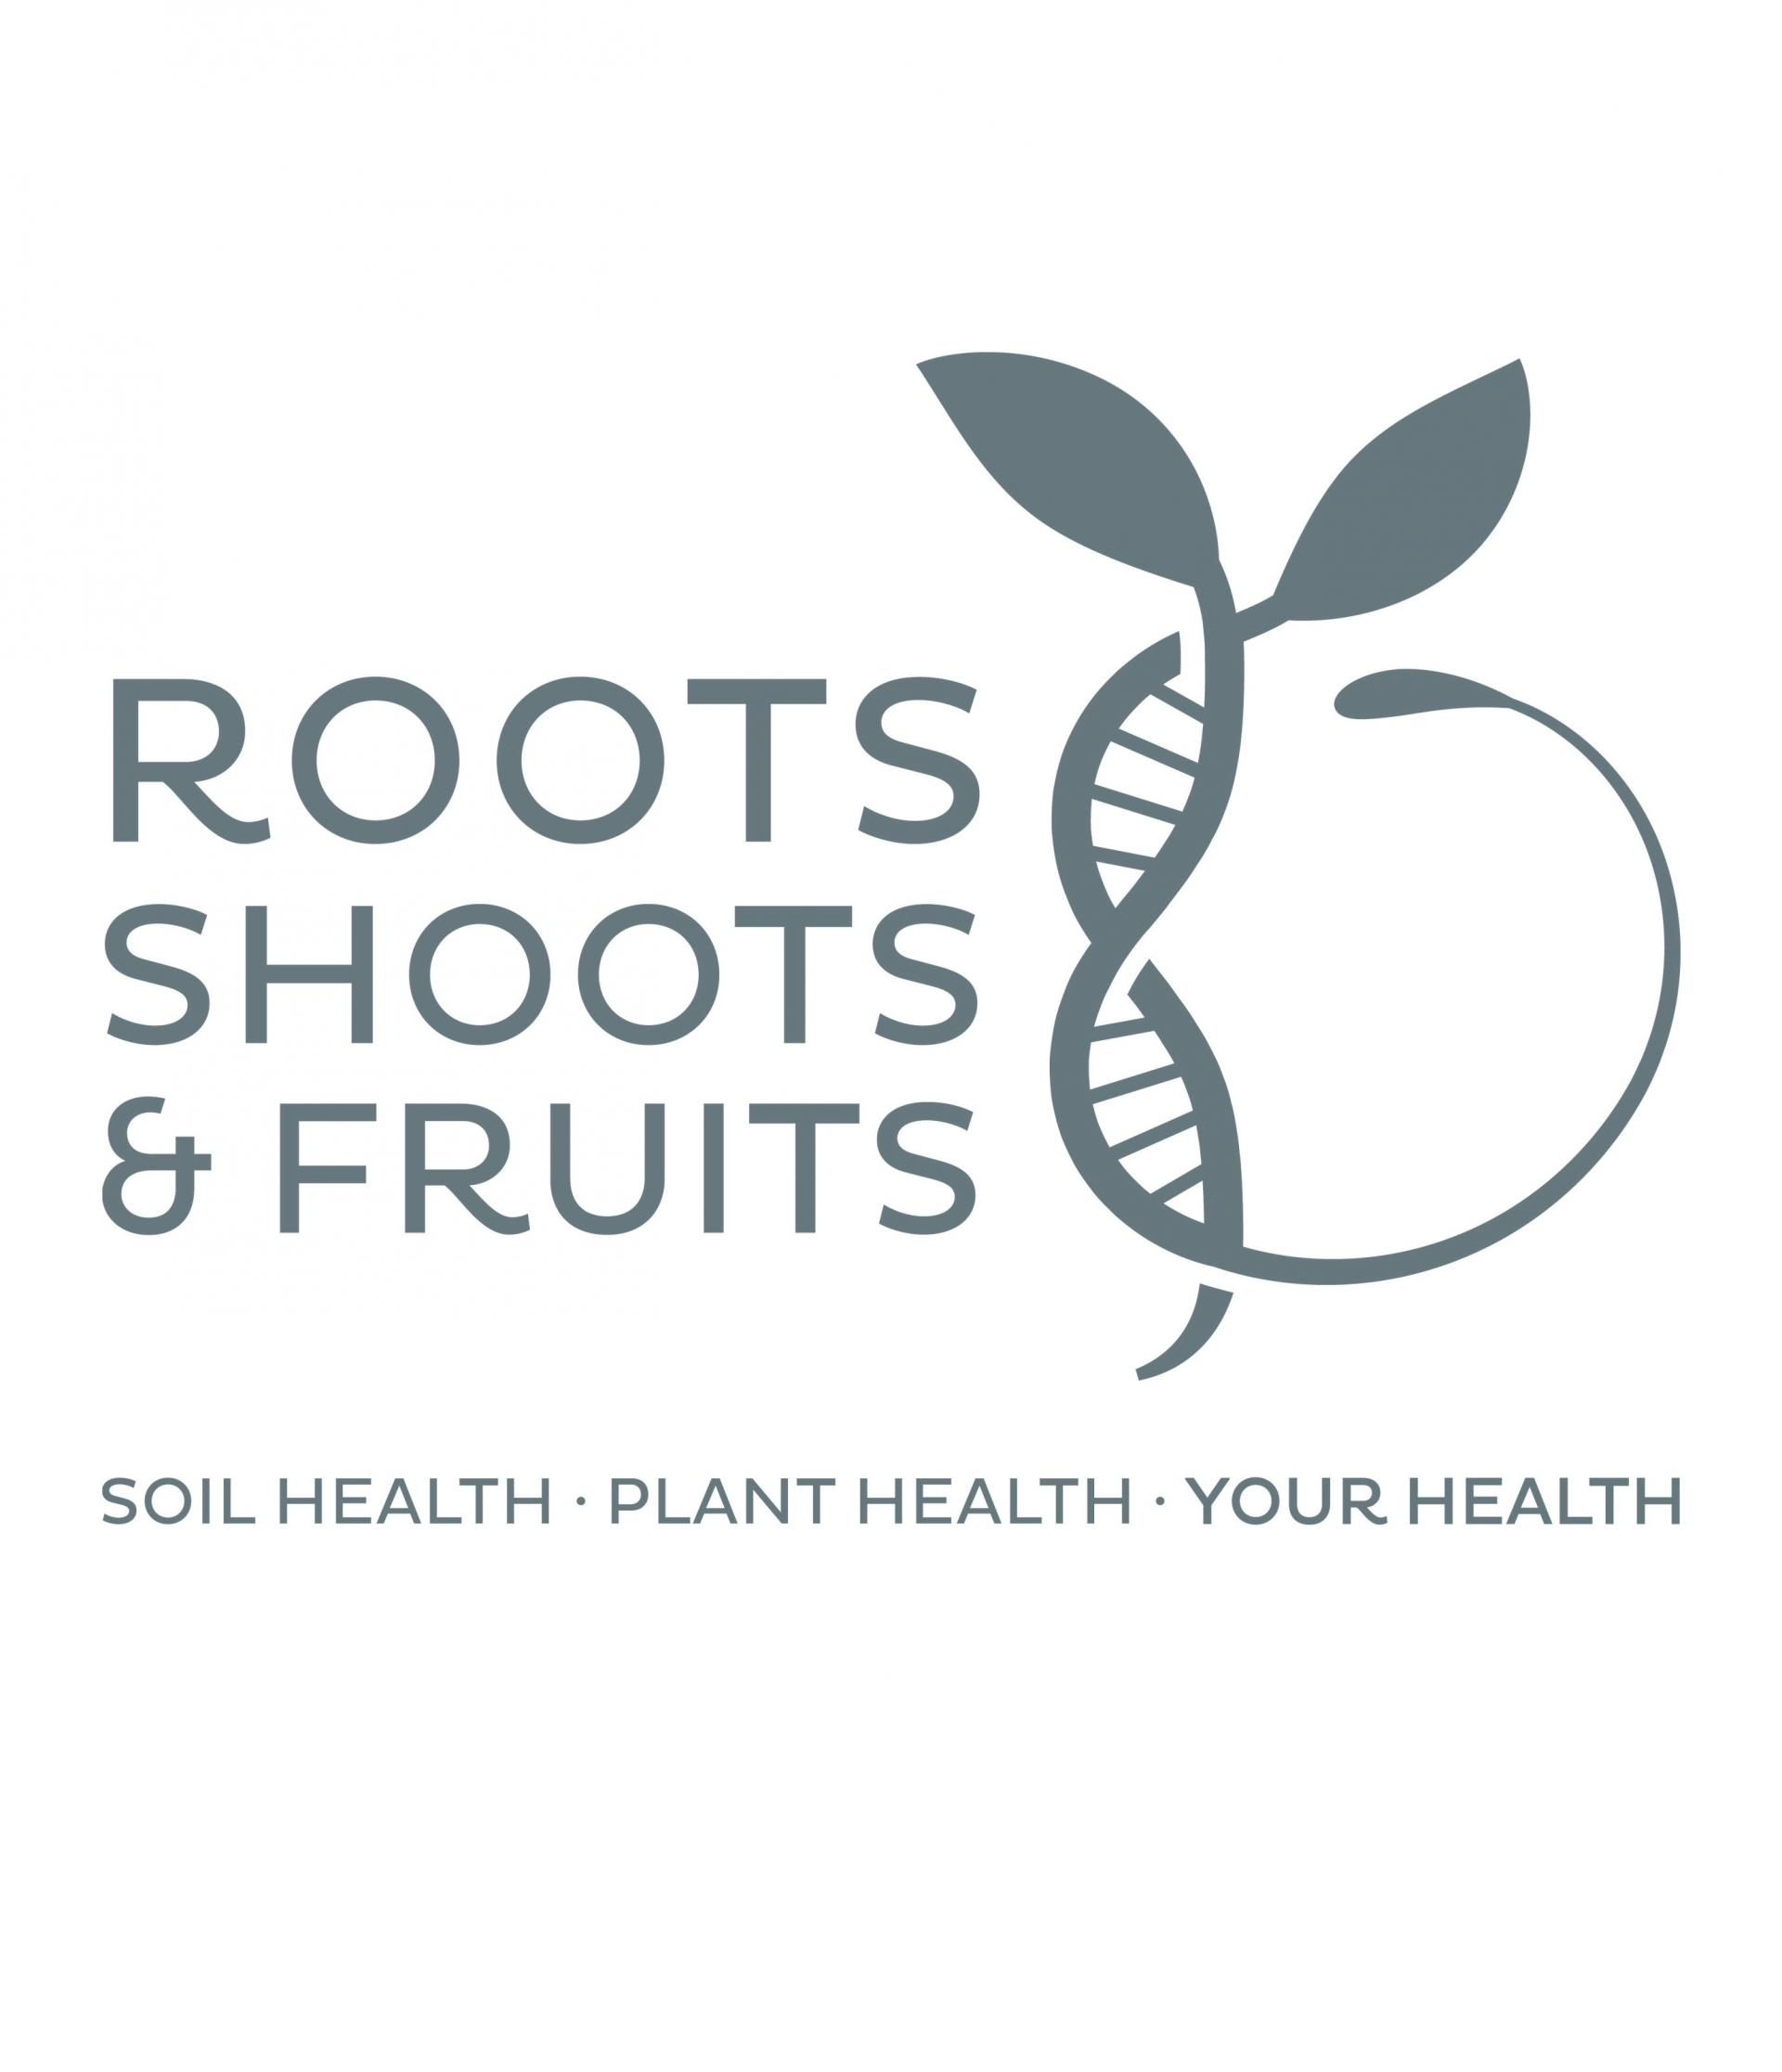 Logo of Roots, Shoots & Fruits